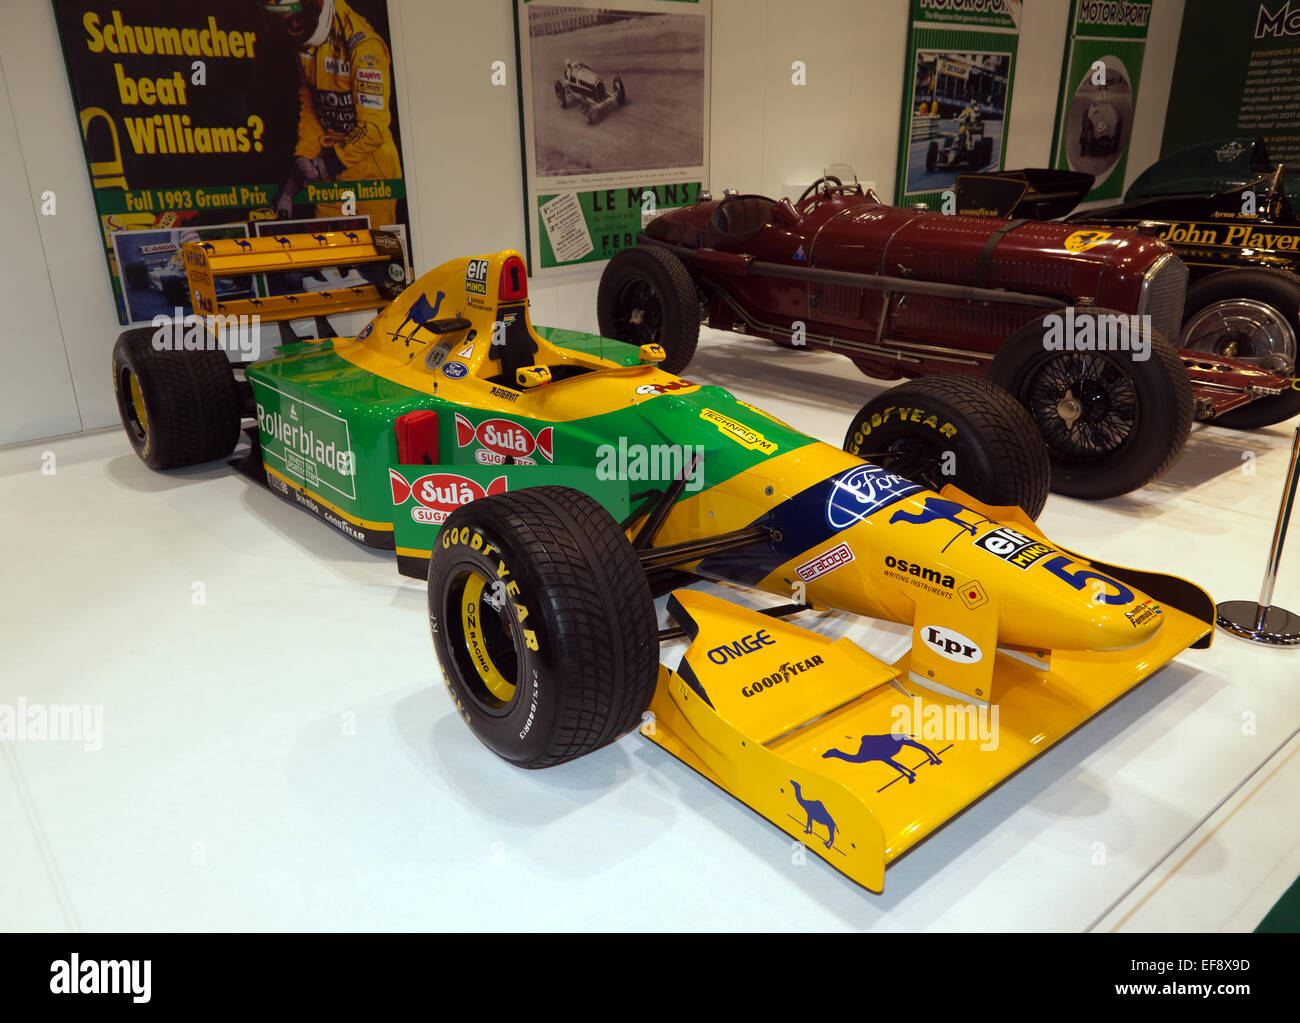 Michael Schumacher's 1993 Benetton B193: designed by Ross Brawn, Schumacher regularly out qualified  Senna in - Stock Image